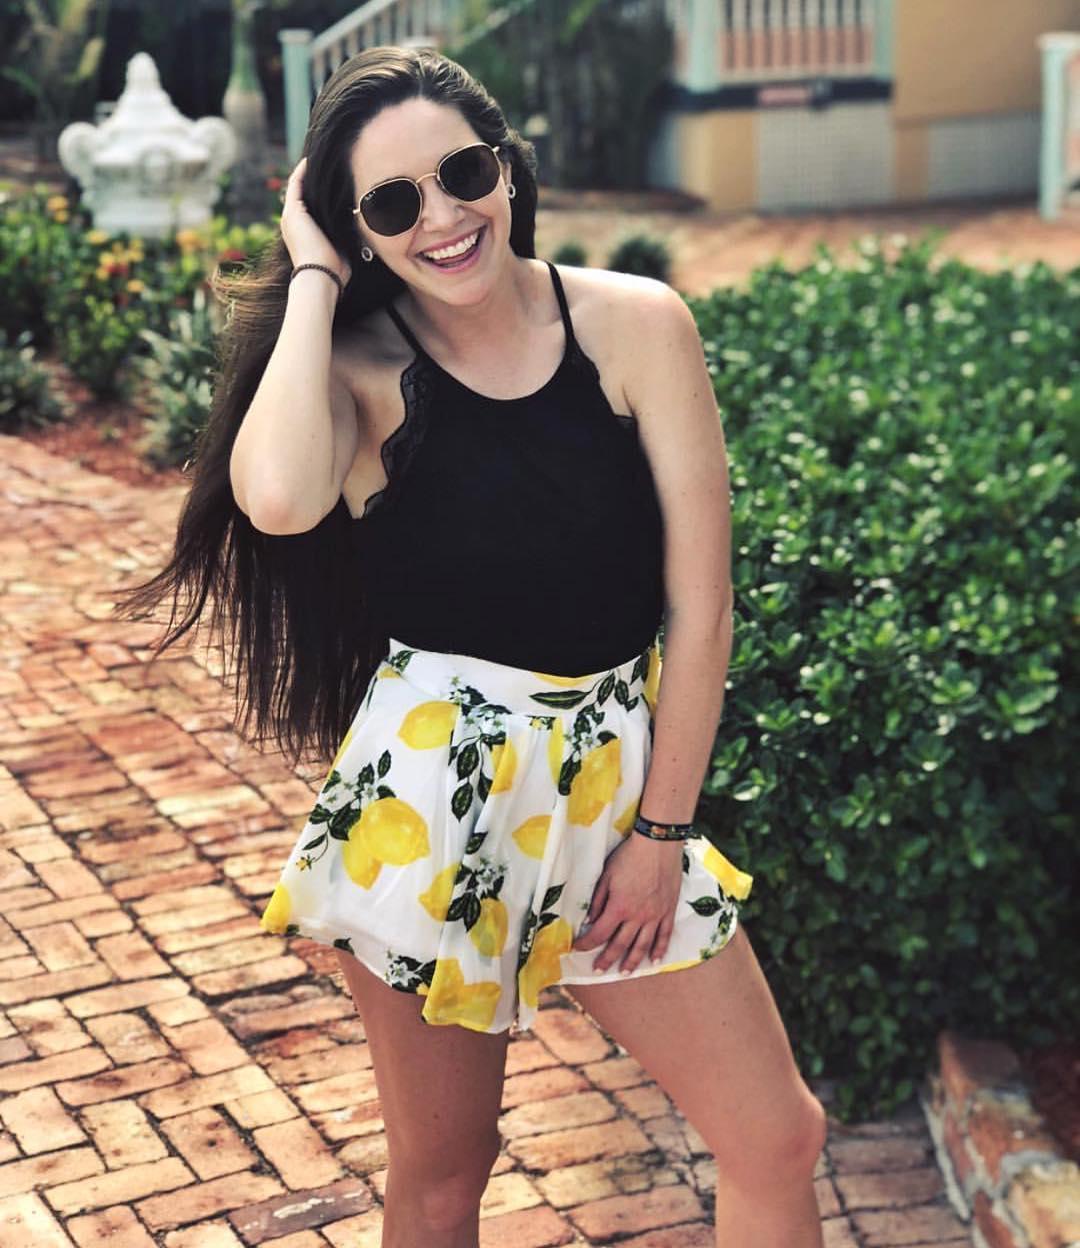 Lemonade Shorts And Black O-Neck Top